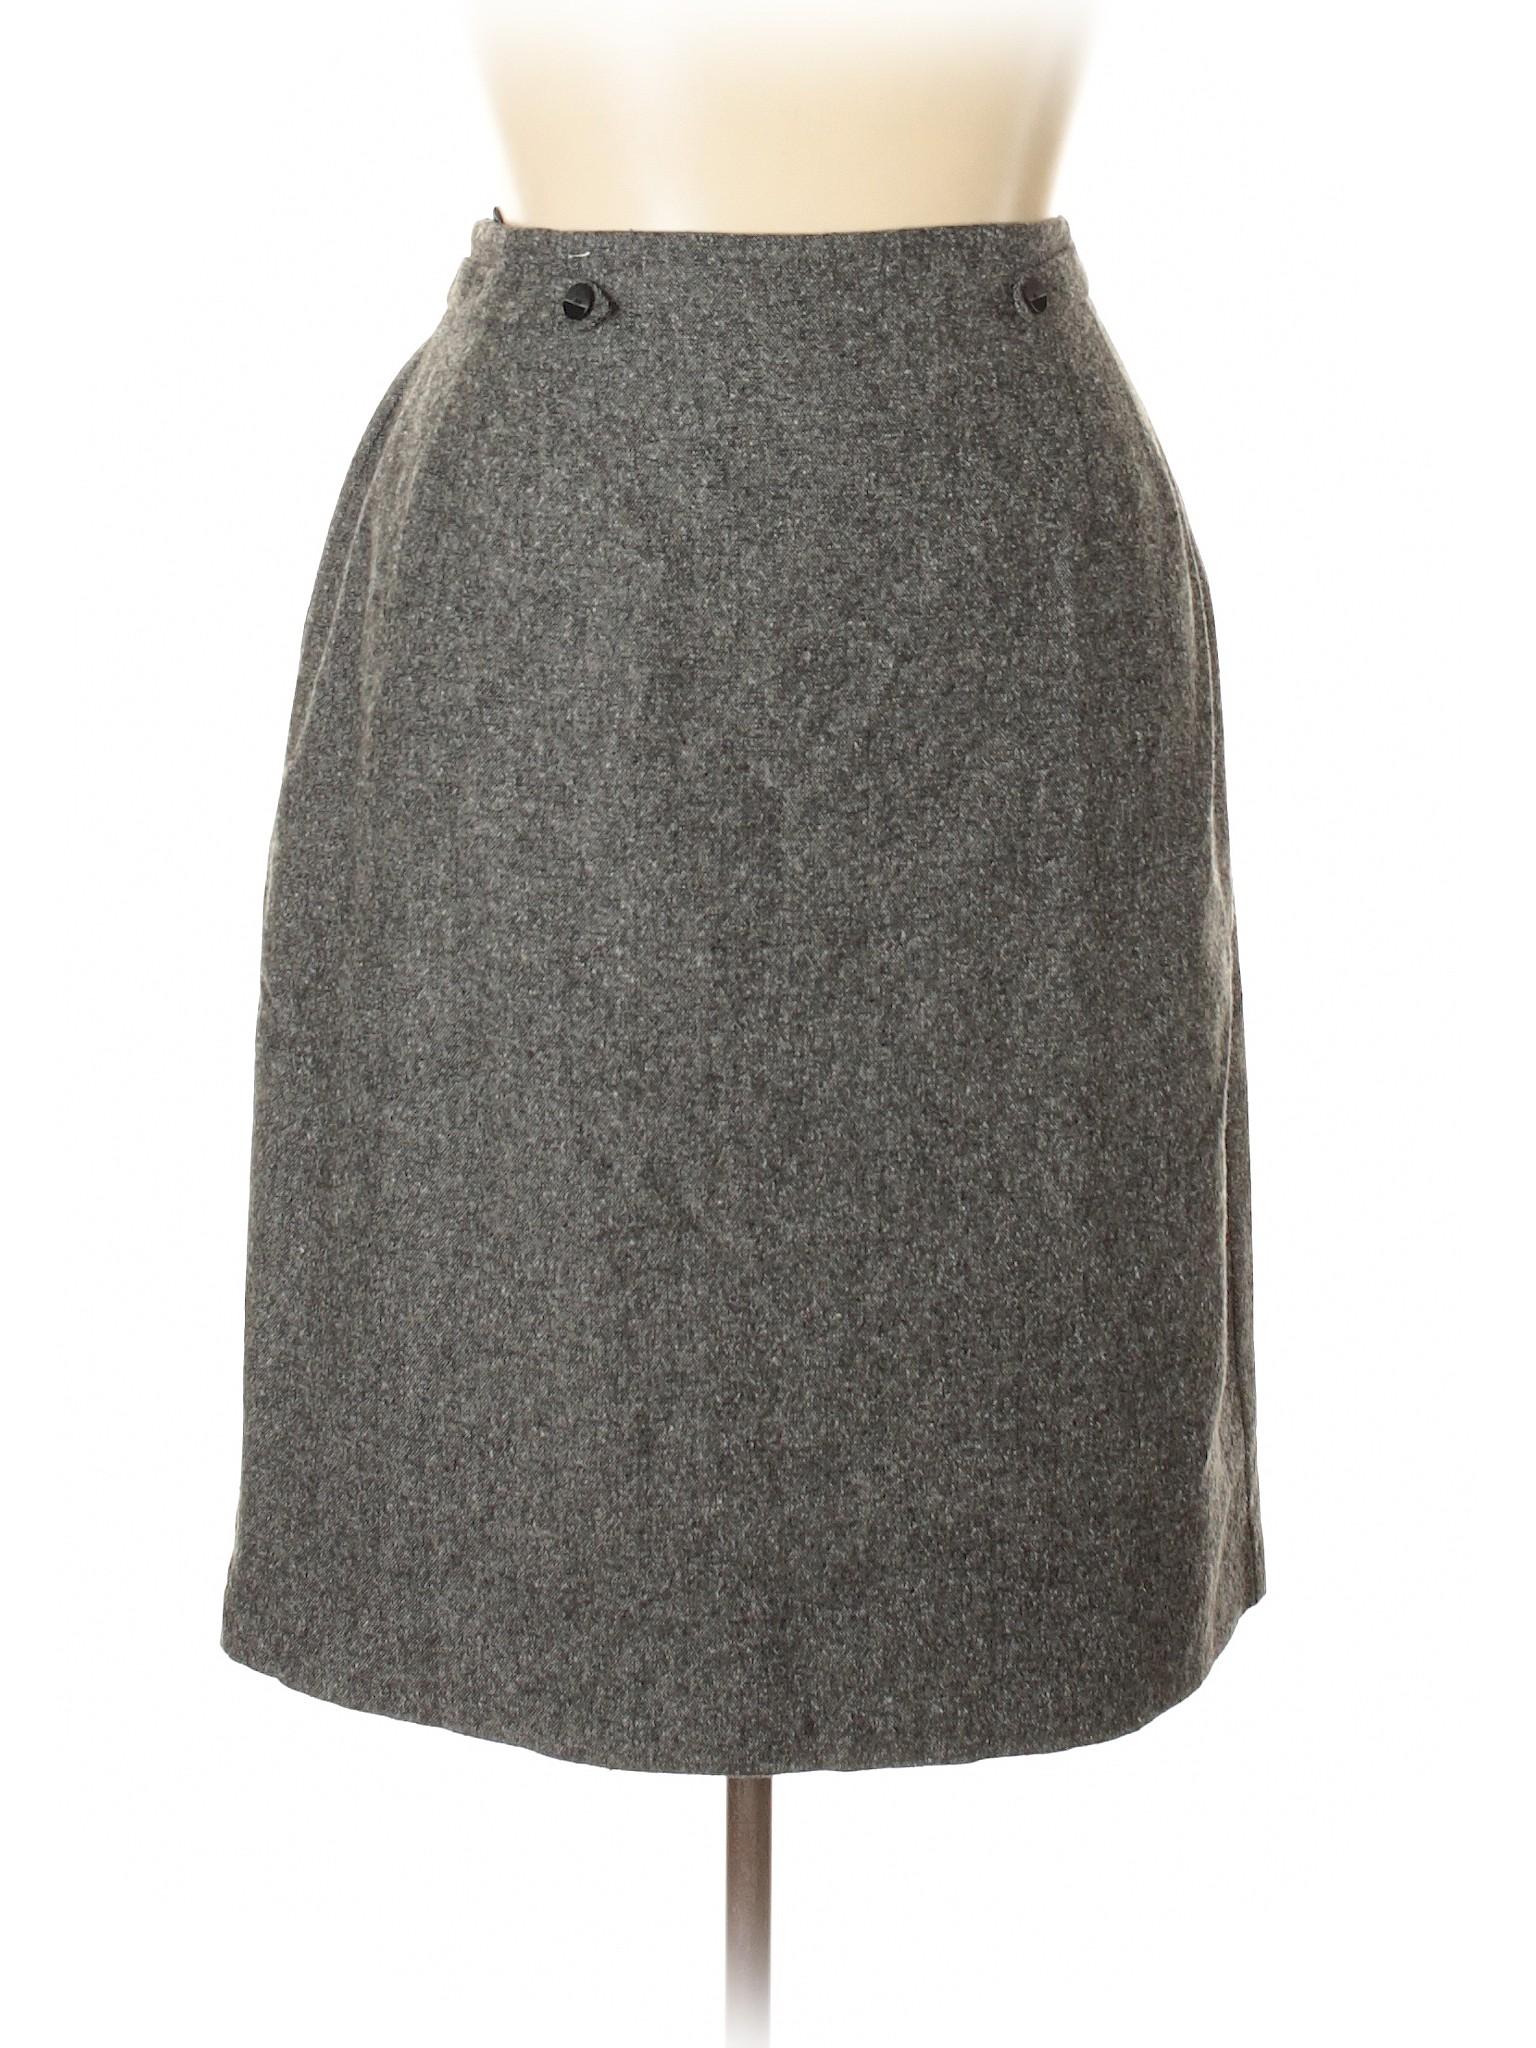 Boutique Skirt Boutique Casual Casual Iwq1n5Pz